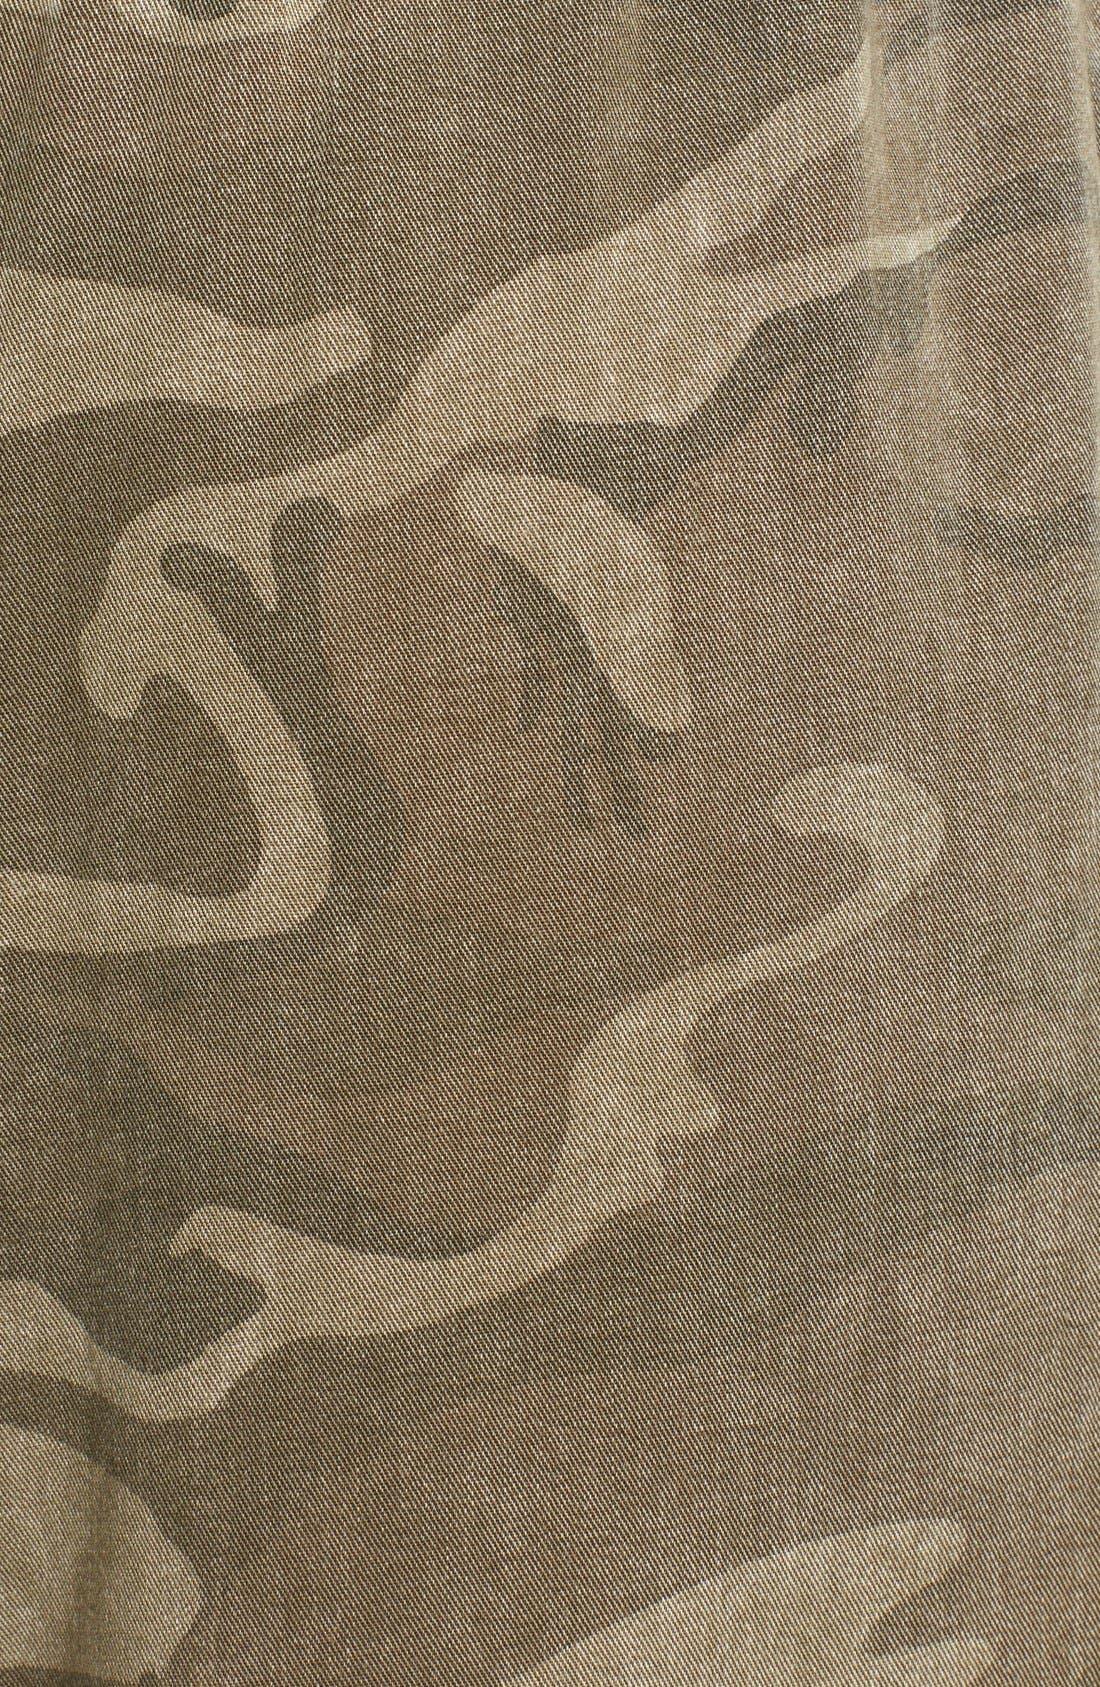 Alternate Image 3  - Current/Elliott Camo Print Drawstring Trousers